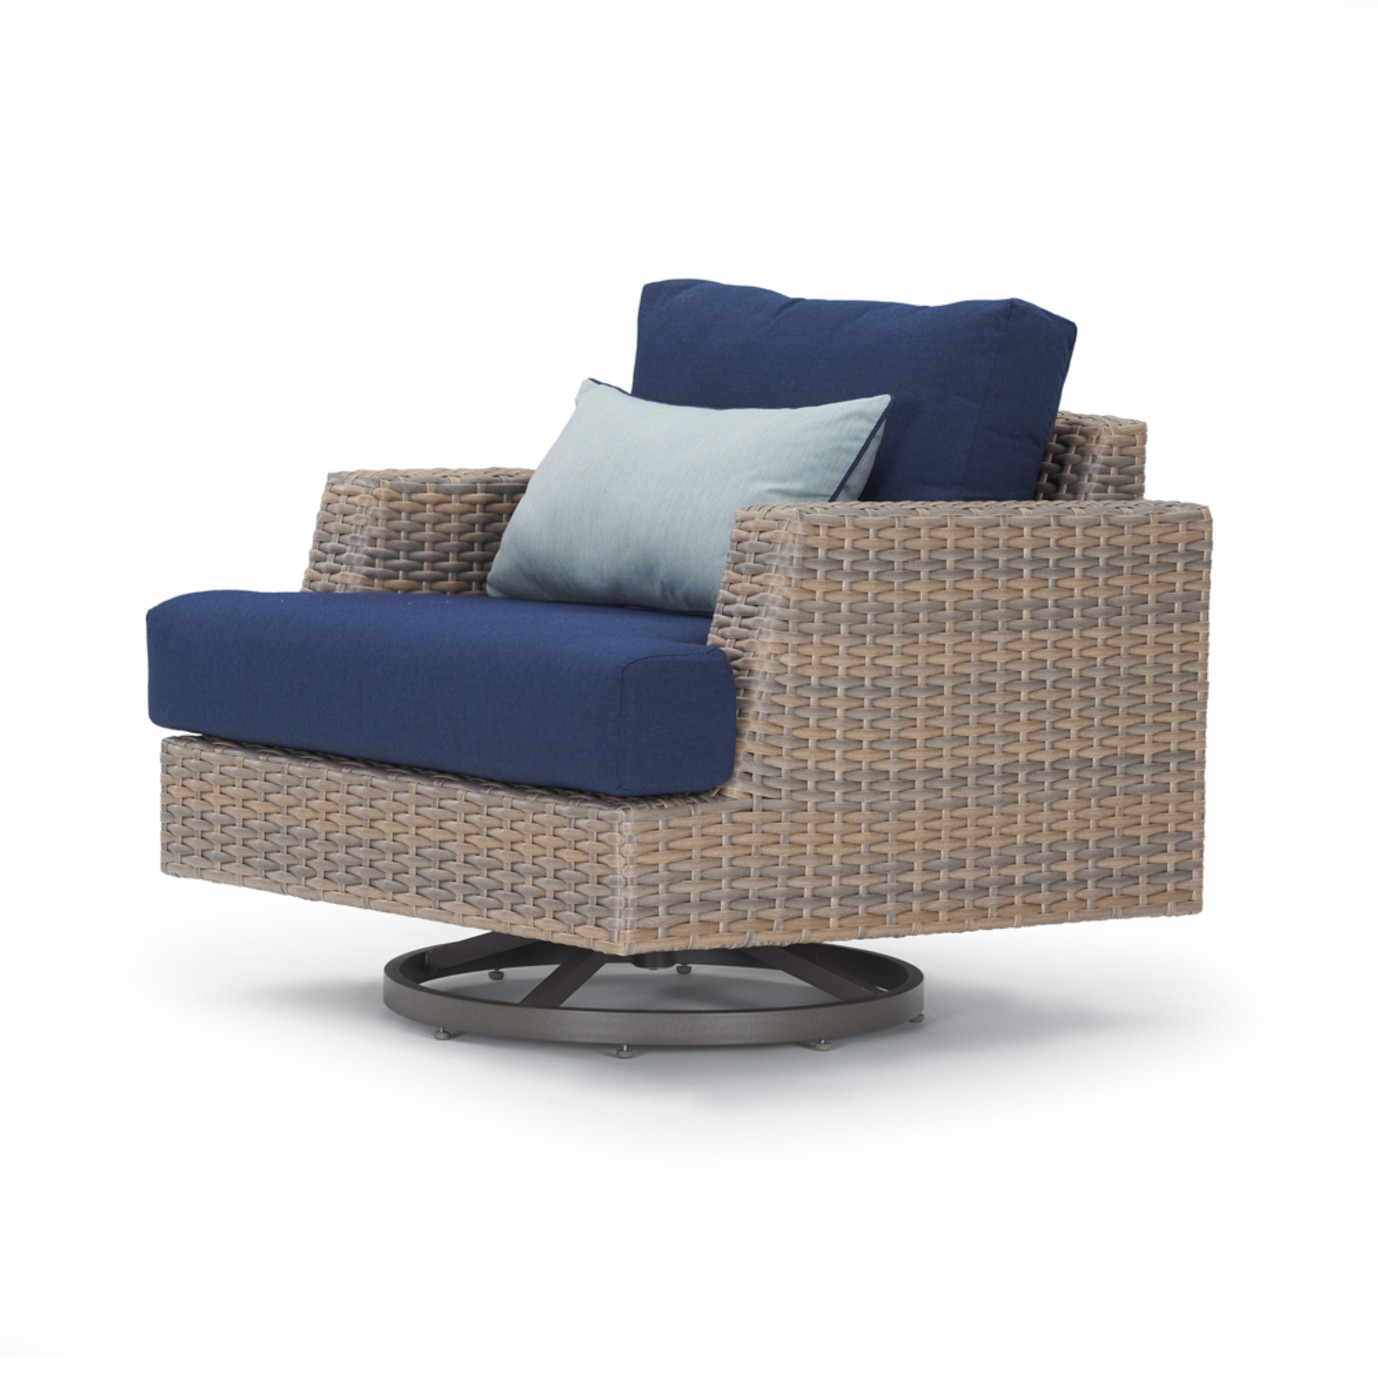 Portofino Repose 7pc Motion Fire Seating Set - Laguna Blue